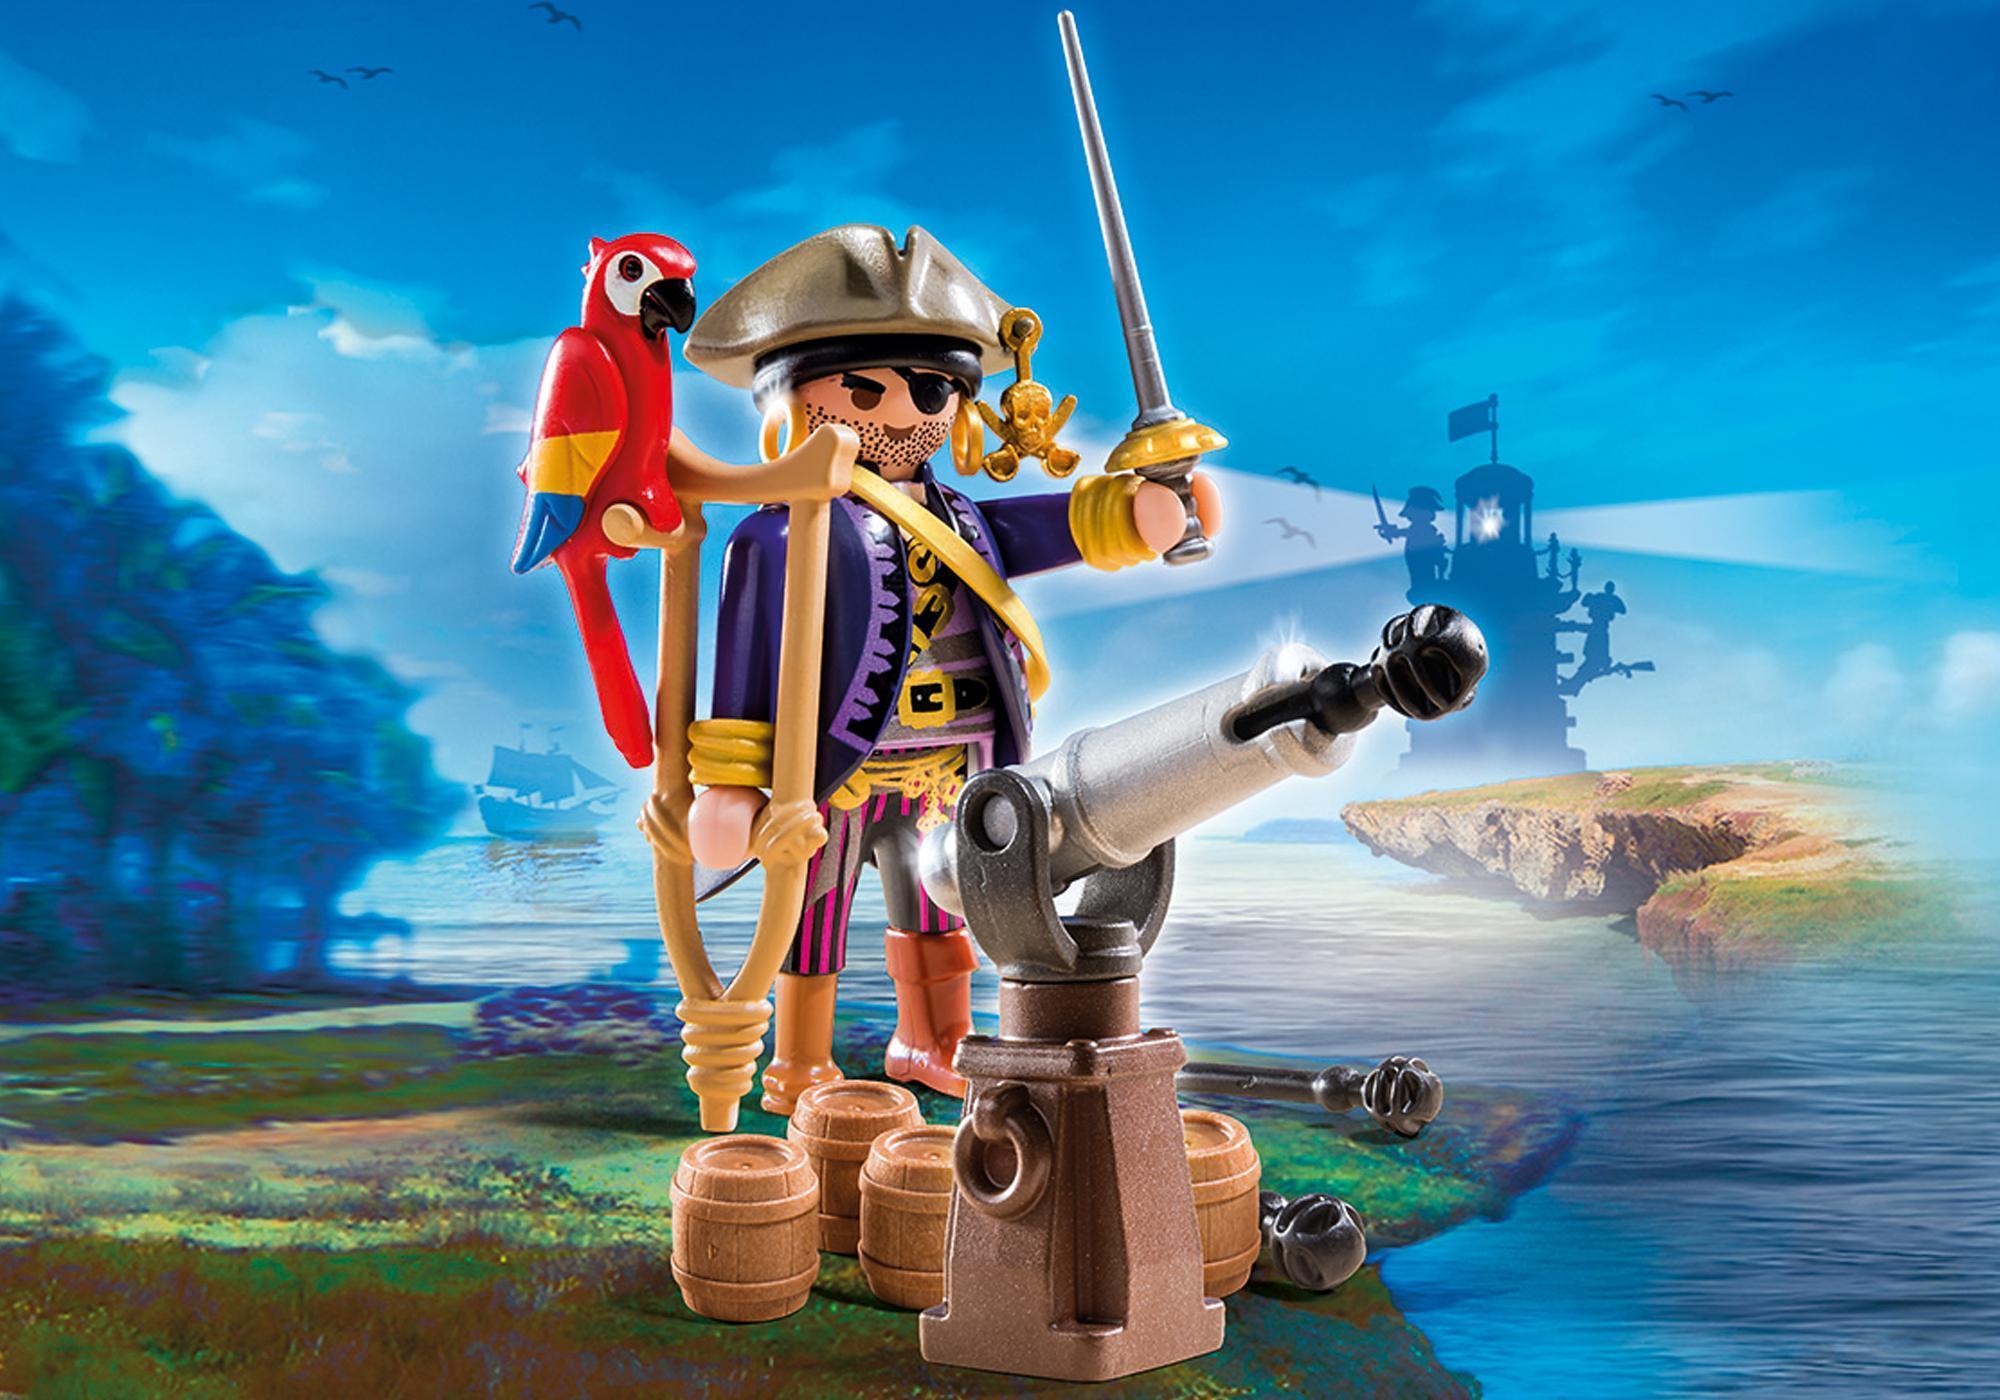 http://media.playmobil.com/i/playmobil/6684_product_detail